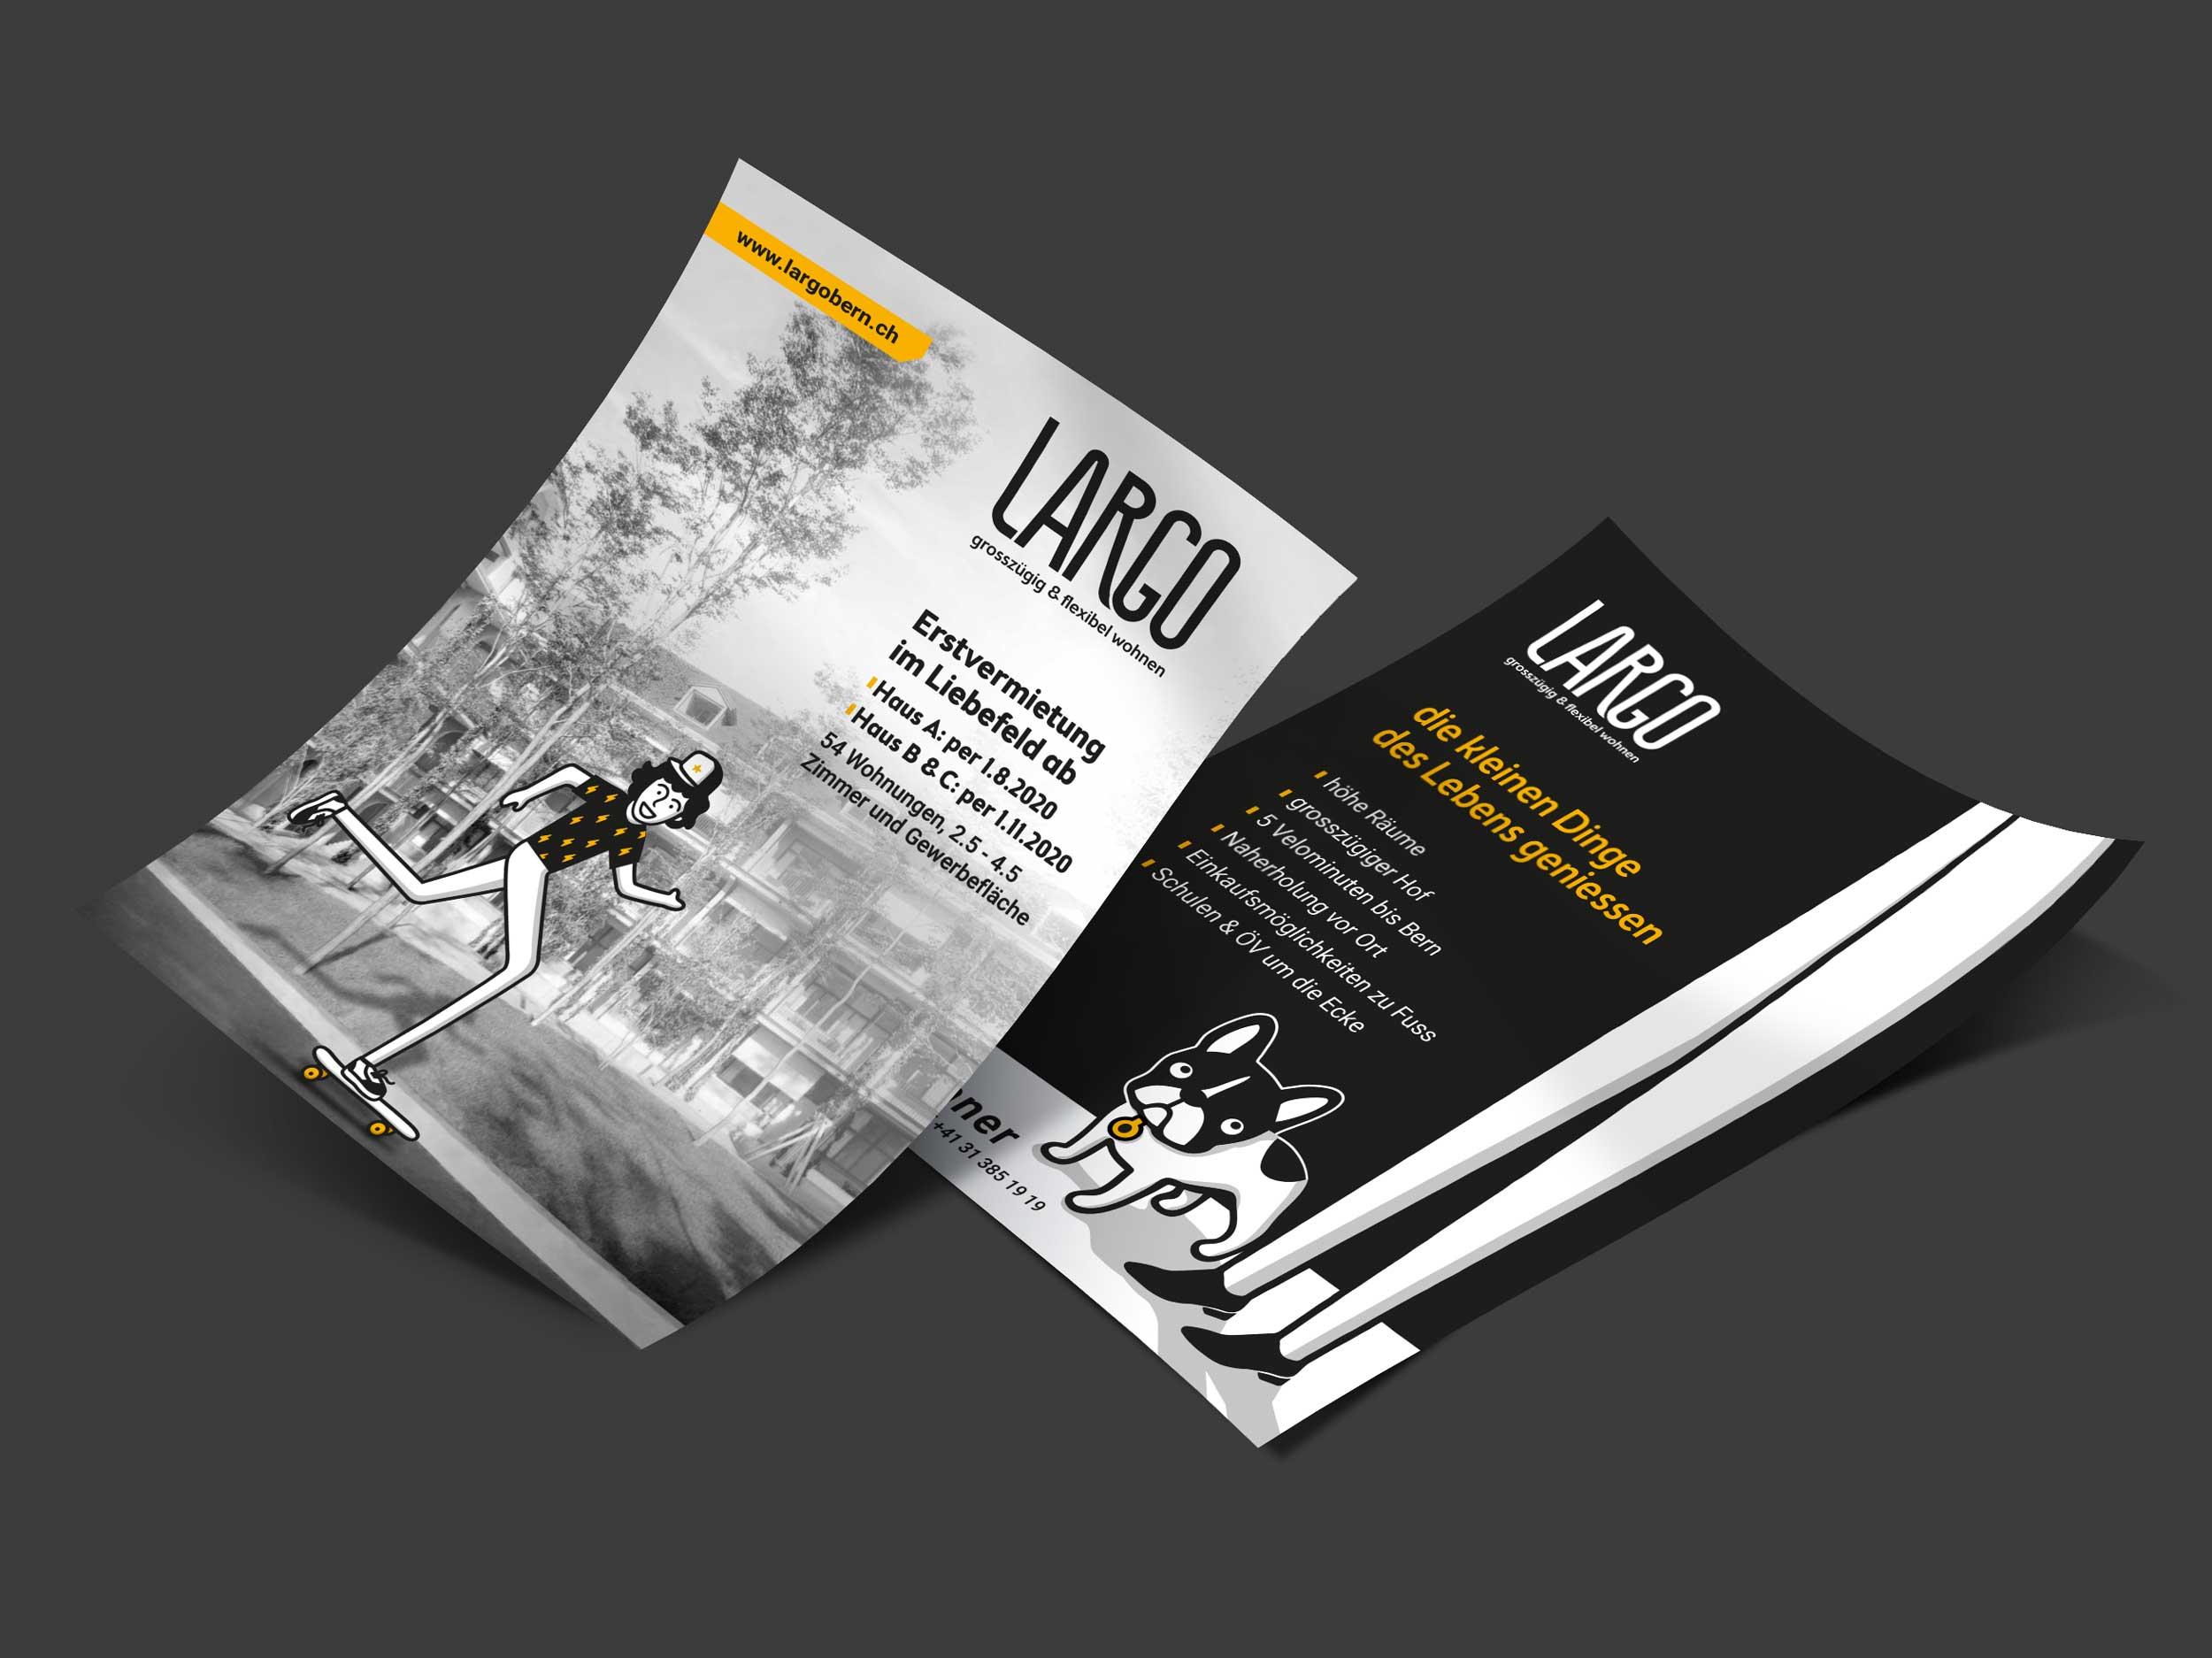 LARGO flyer by GPU Design